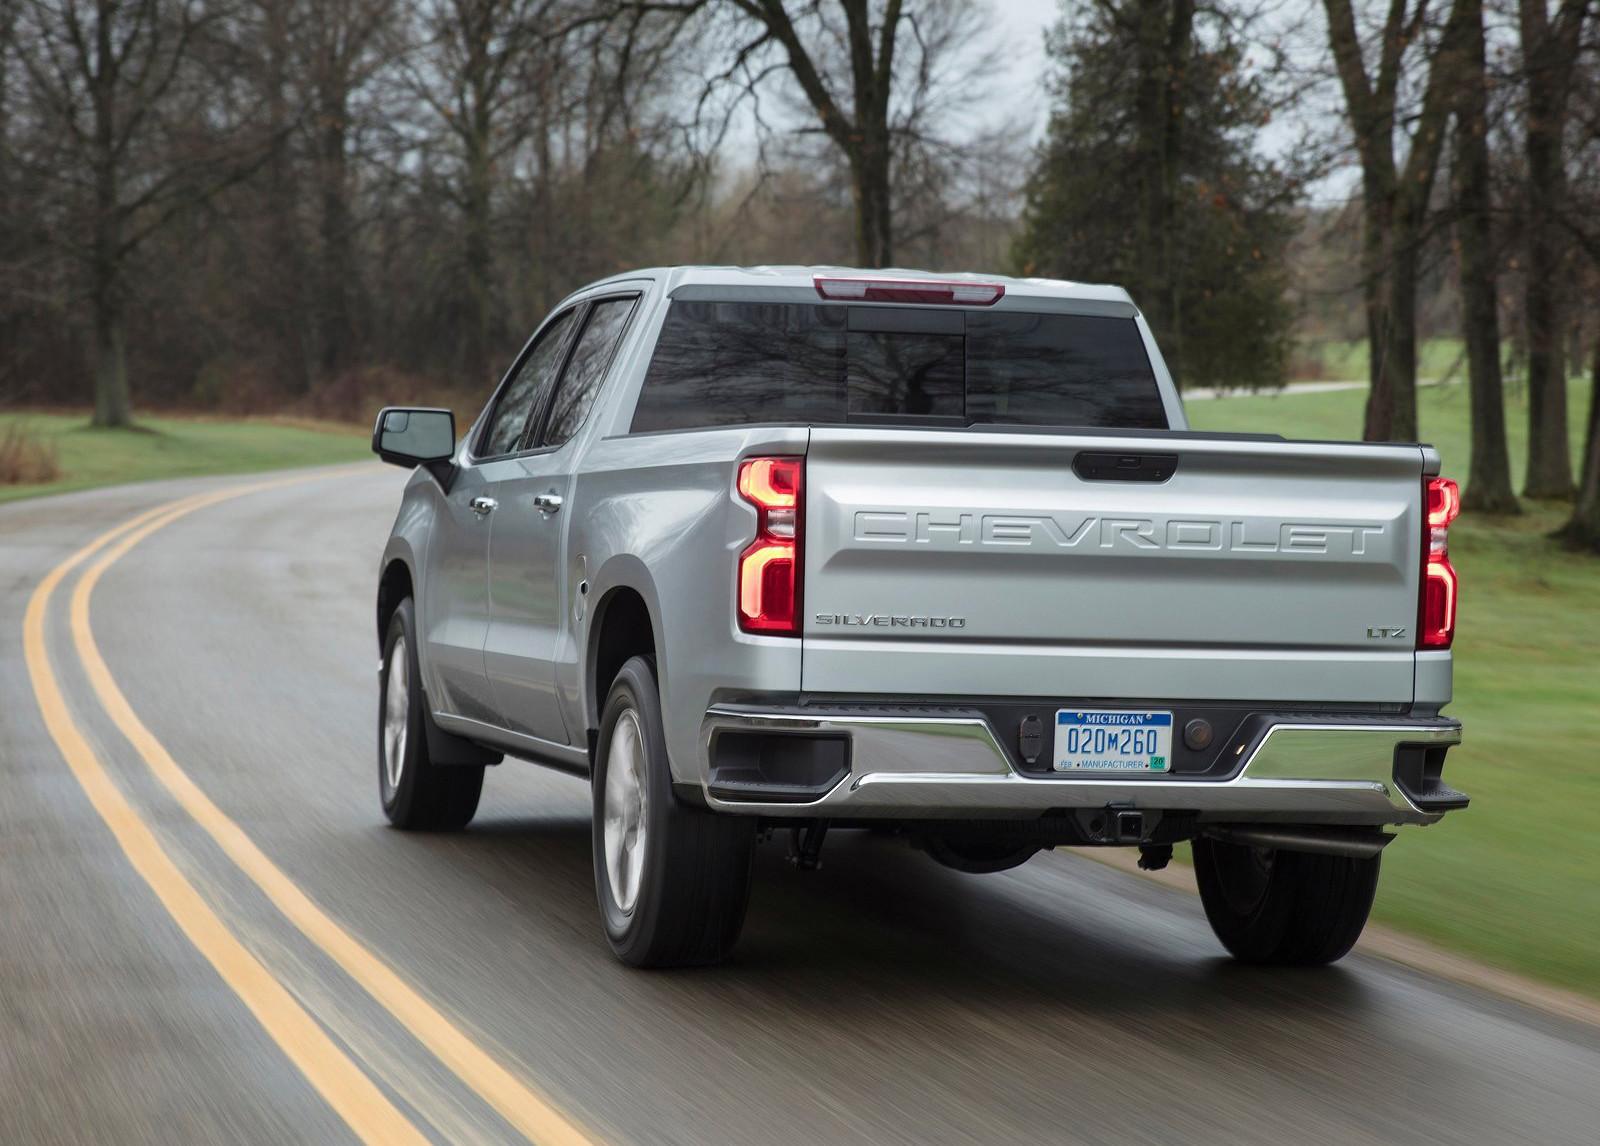 Foto de Chevrolet Cheyenne 2019 (11/14)